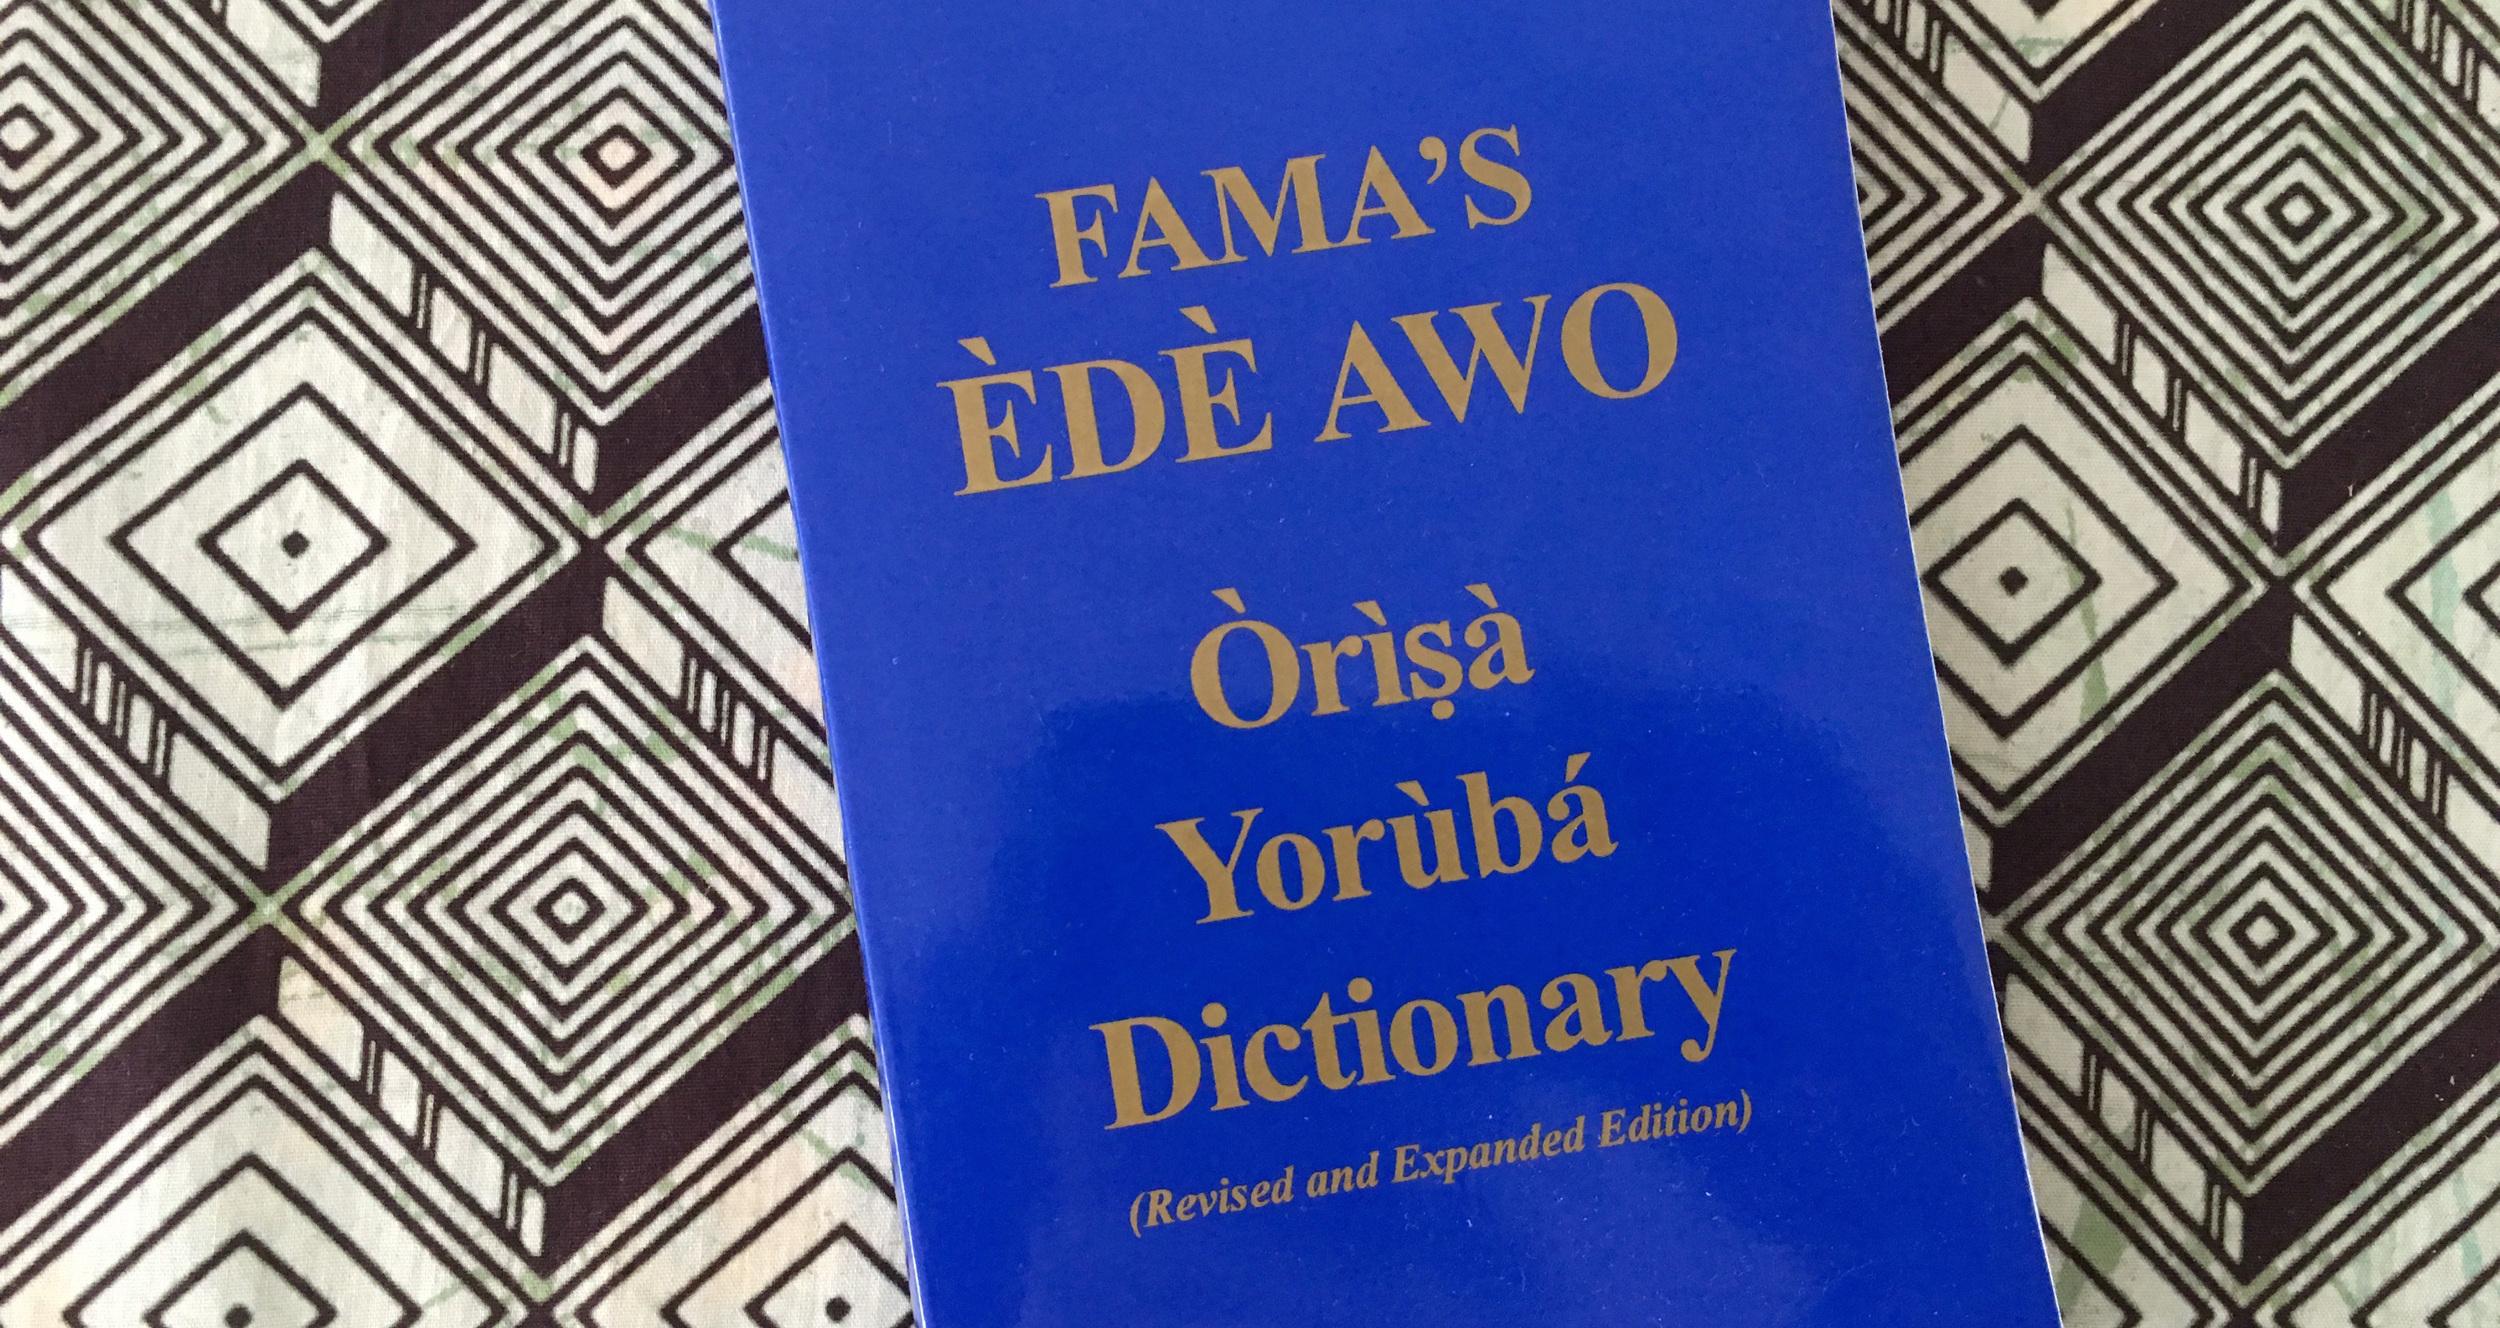 Fama's ede awo dictionary, lukumi, espanol, yoruba